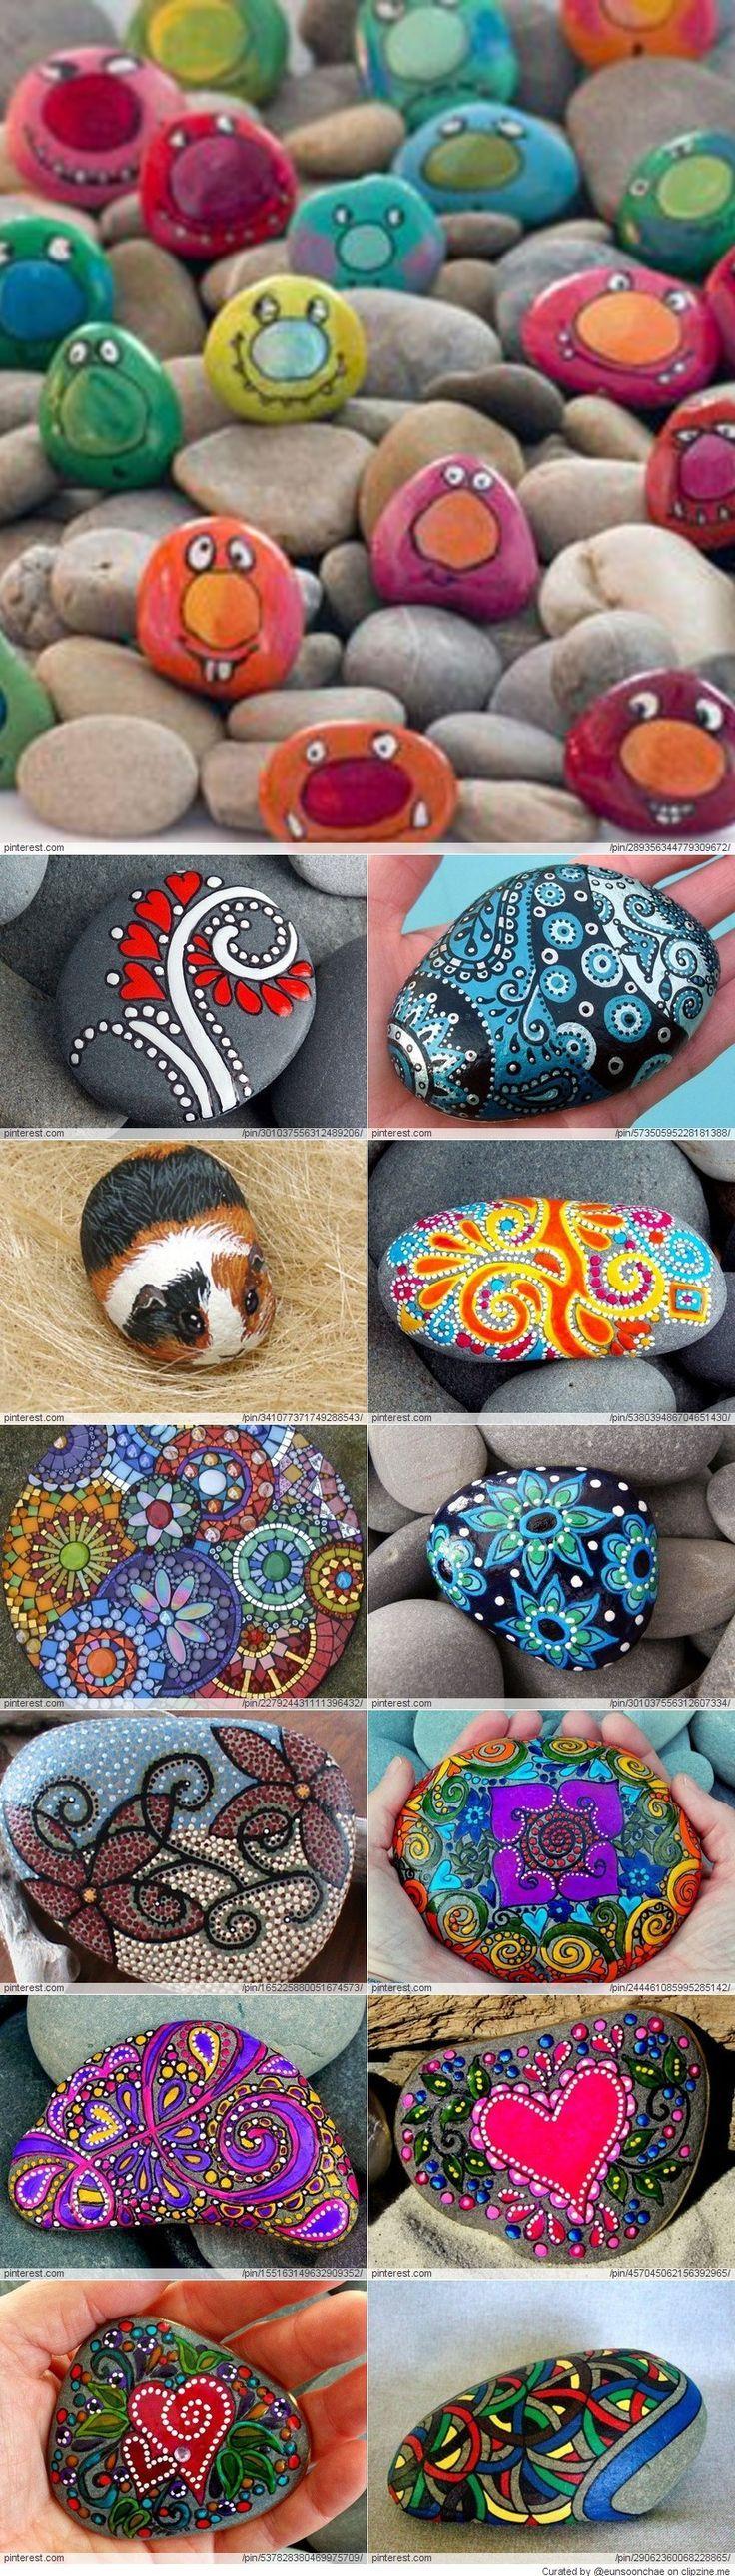 great idea for stone art love the